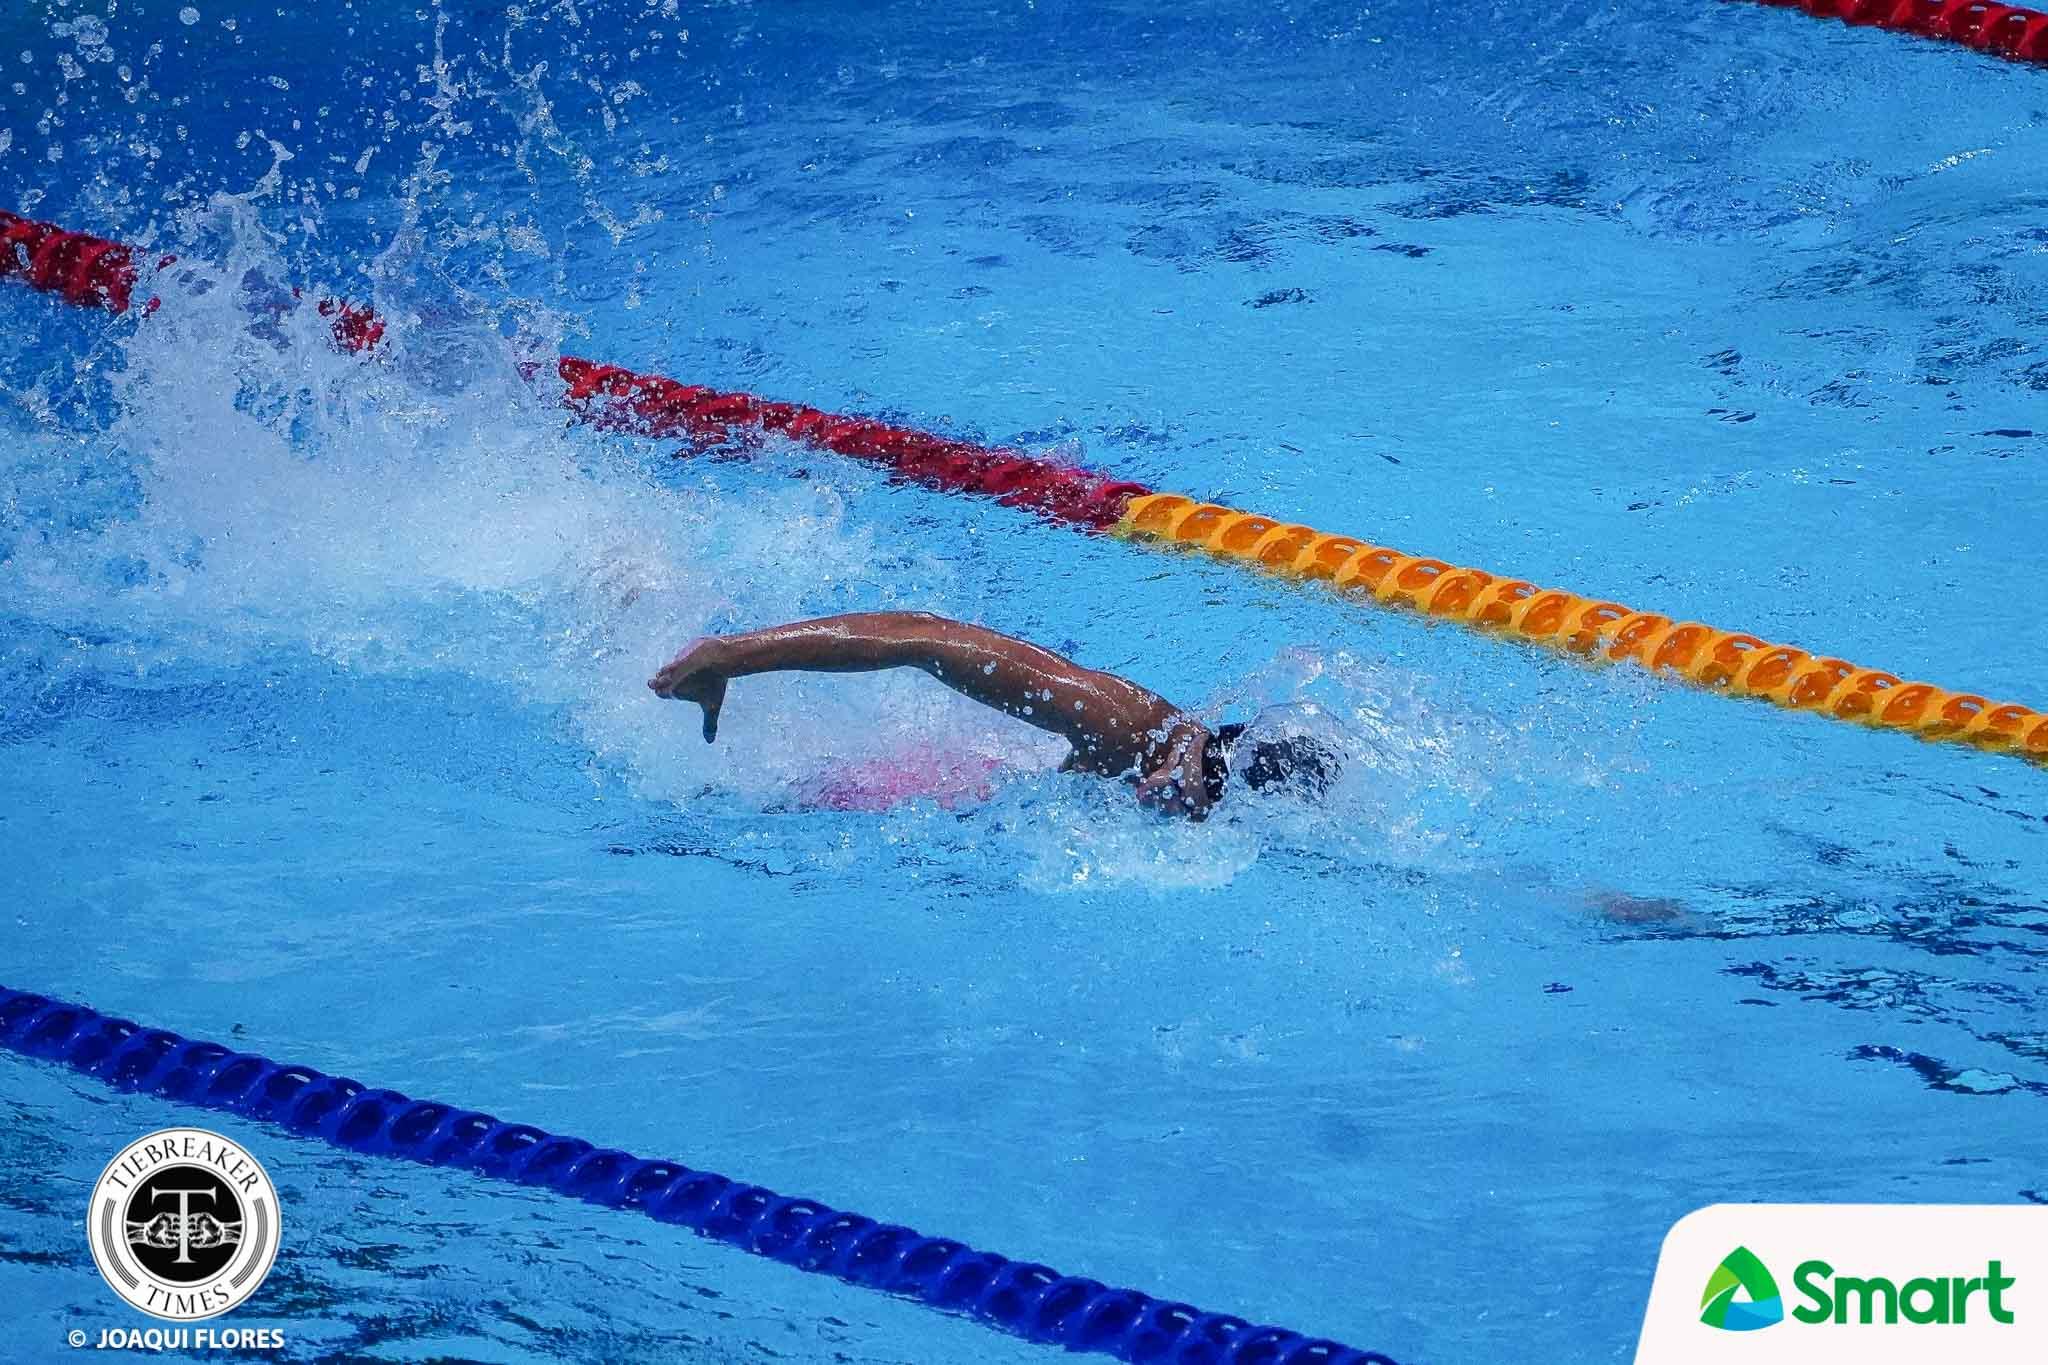 Tiebreaker Times Deiparine, women's 4x100m take SEAG silver as Alkhaldi hits OST-B time 2019 SEA Games News Swimming  Remedy Rule Jasmine Alkhaldi James Deiparine Desirae Mangaoang Chole Isleta 2019 SEA Games - Swimming 2019 SEA Games